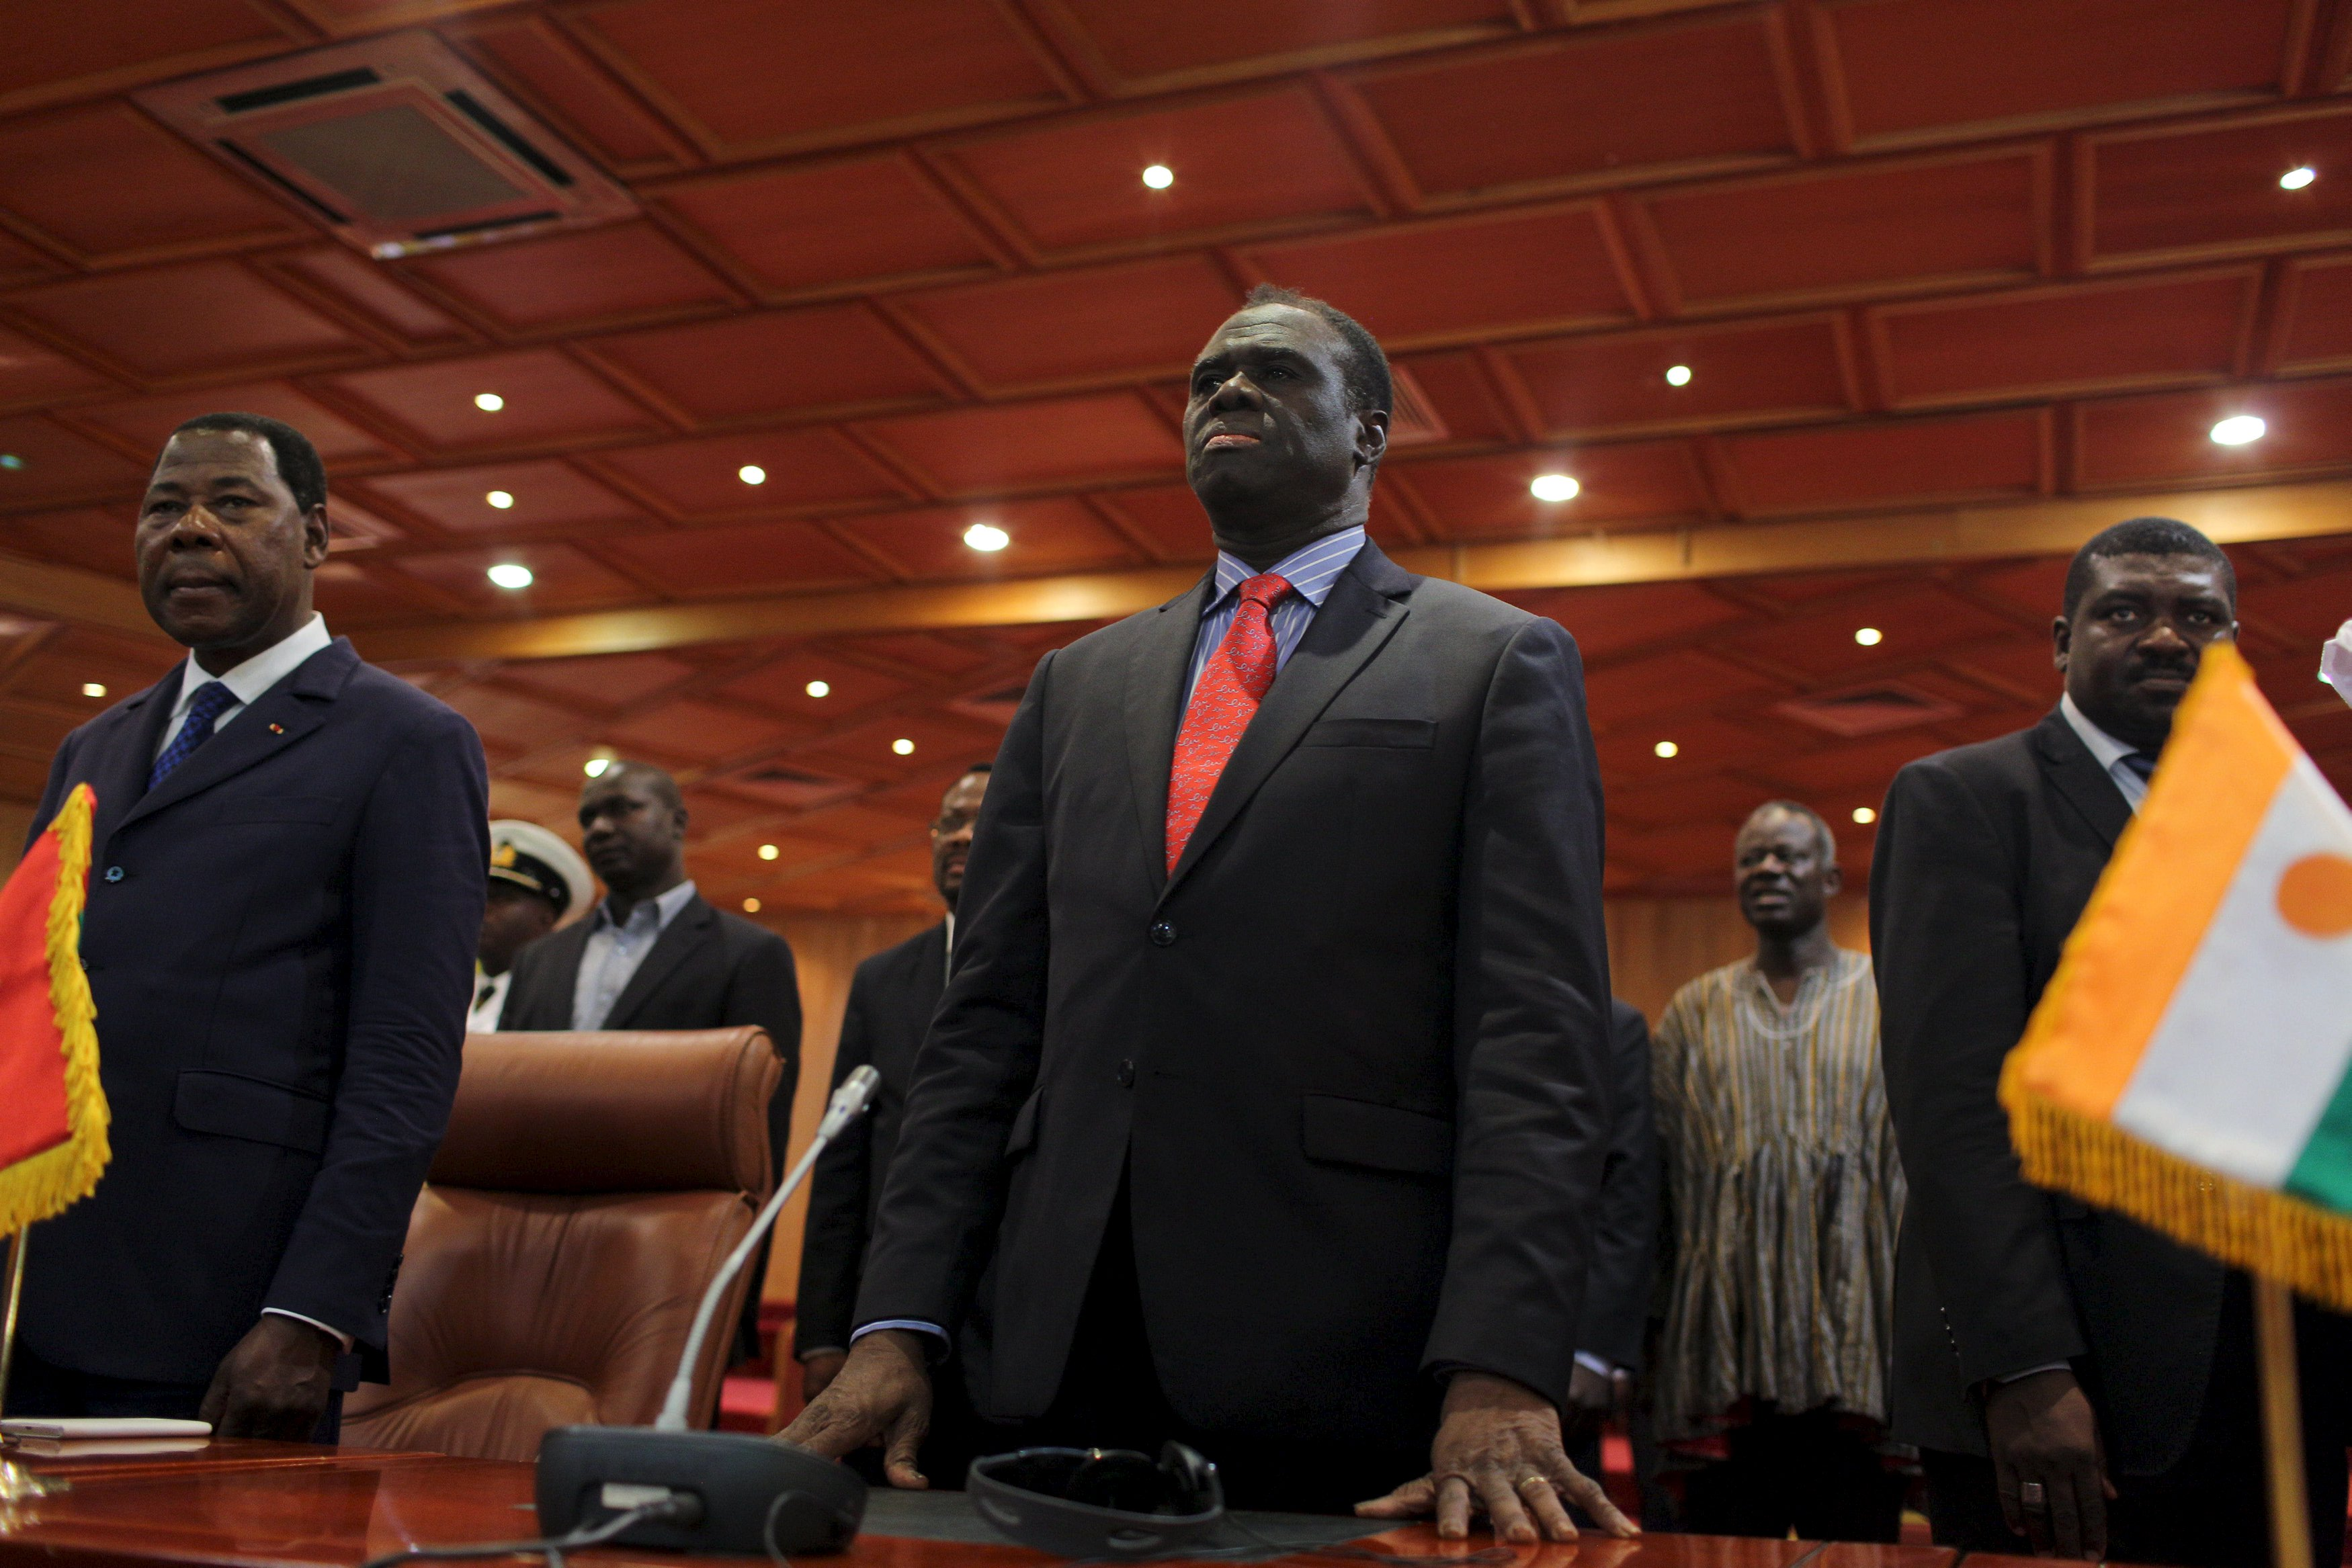 Burkina Faso President Michel Kafando (C) attends a ceremony marking the return of the transitional government in Ouagadougou, Burkina Faso, September 23, 2015. REUTERS/Joe Penney